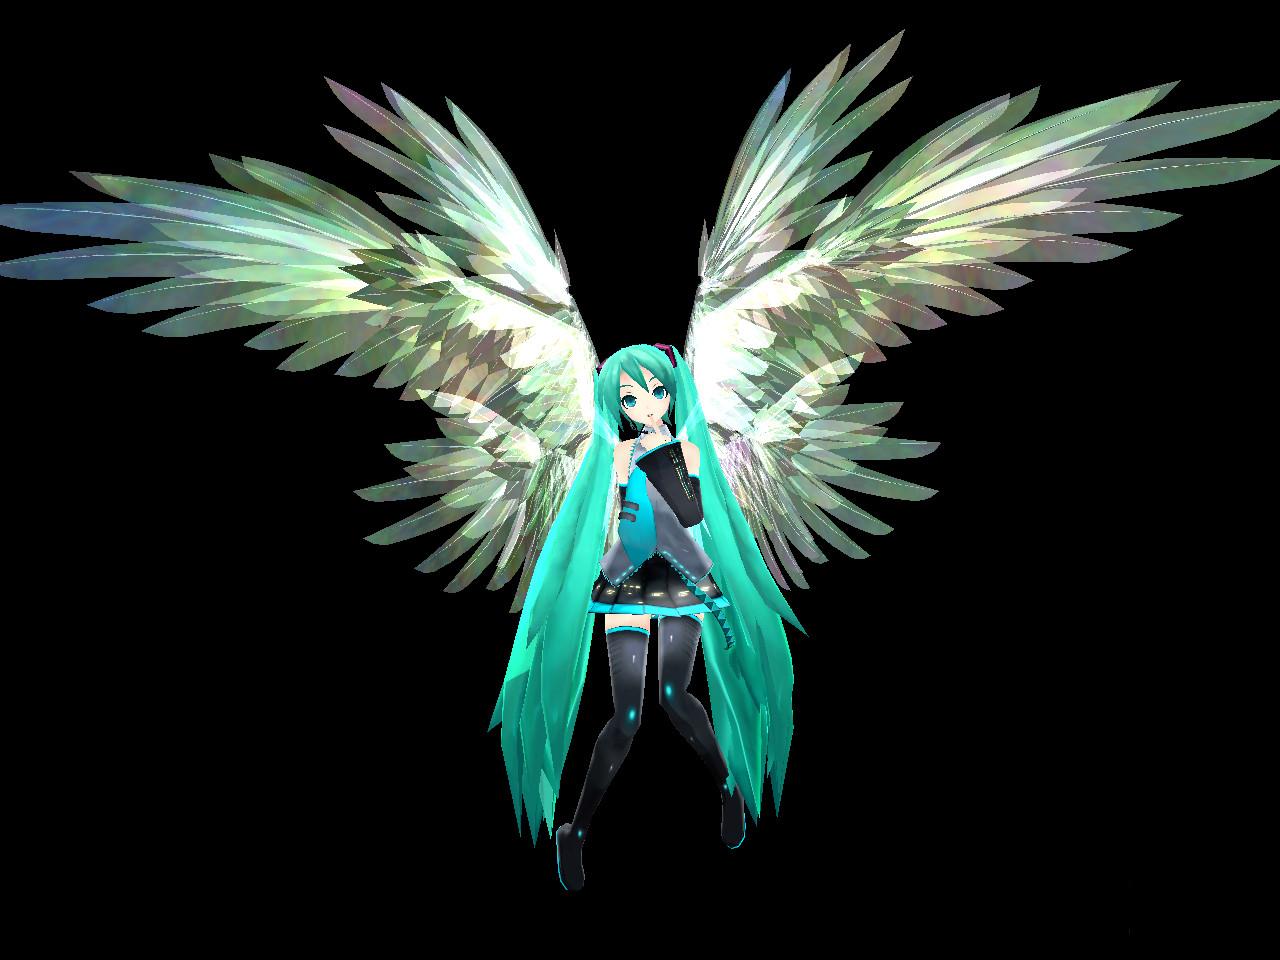 hatsune miku angel wallpapers - photo #3